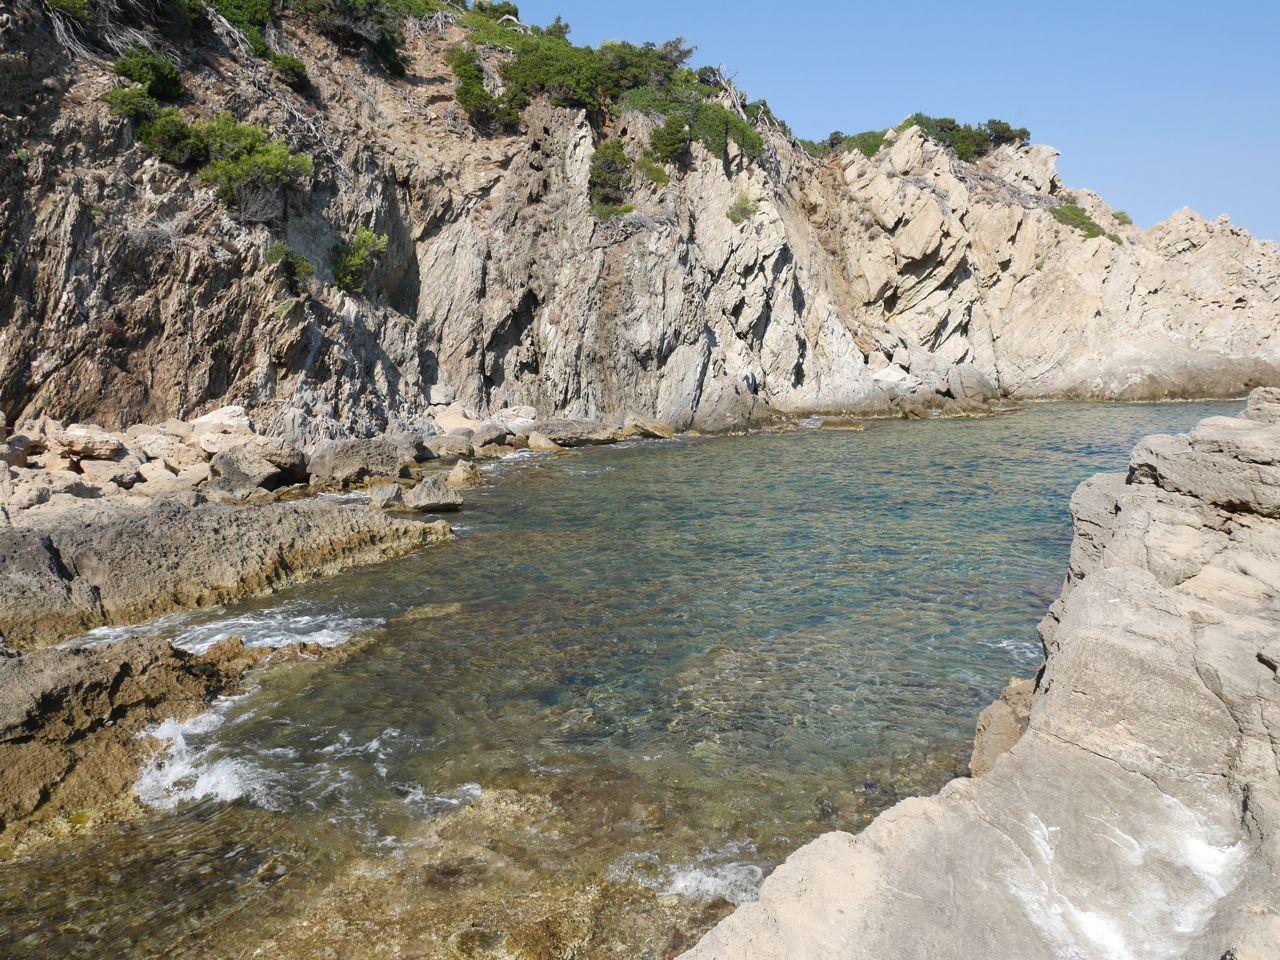 Calanque du Nertassier - Port Cros